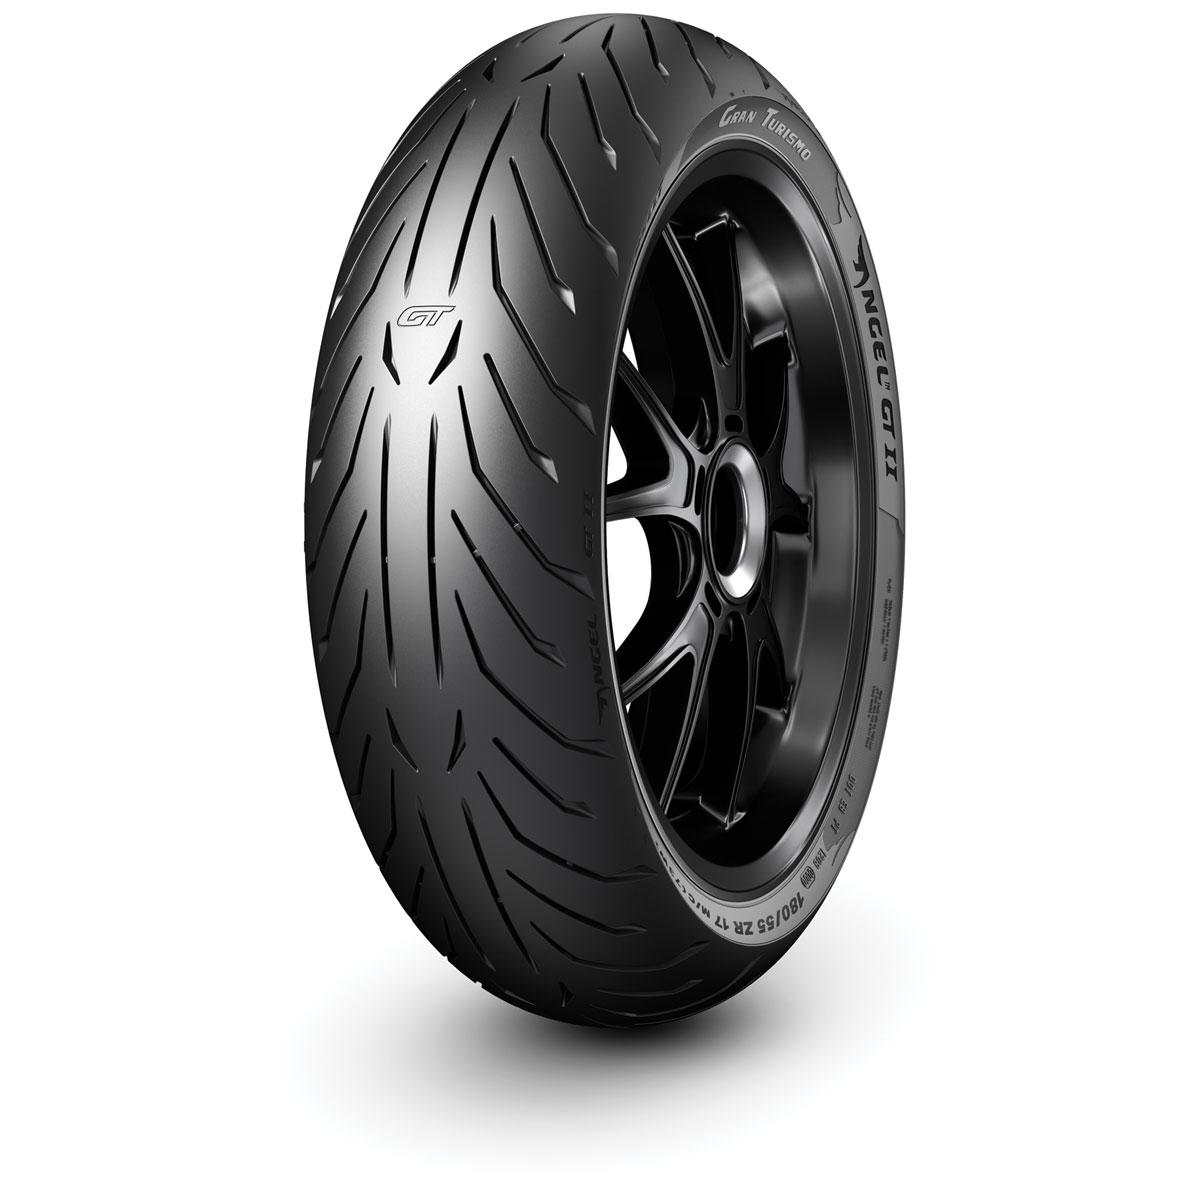 Pirelli Angel GT II 180/55ZR17 Rear Tire